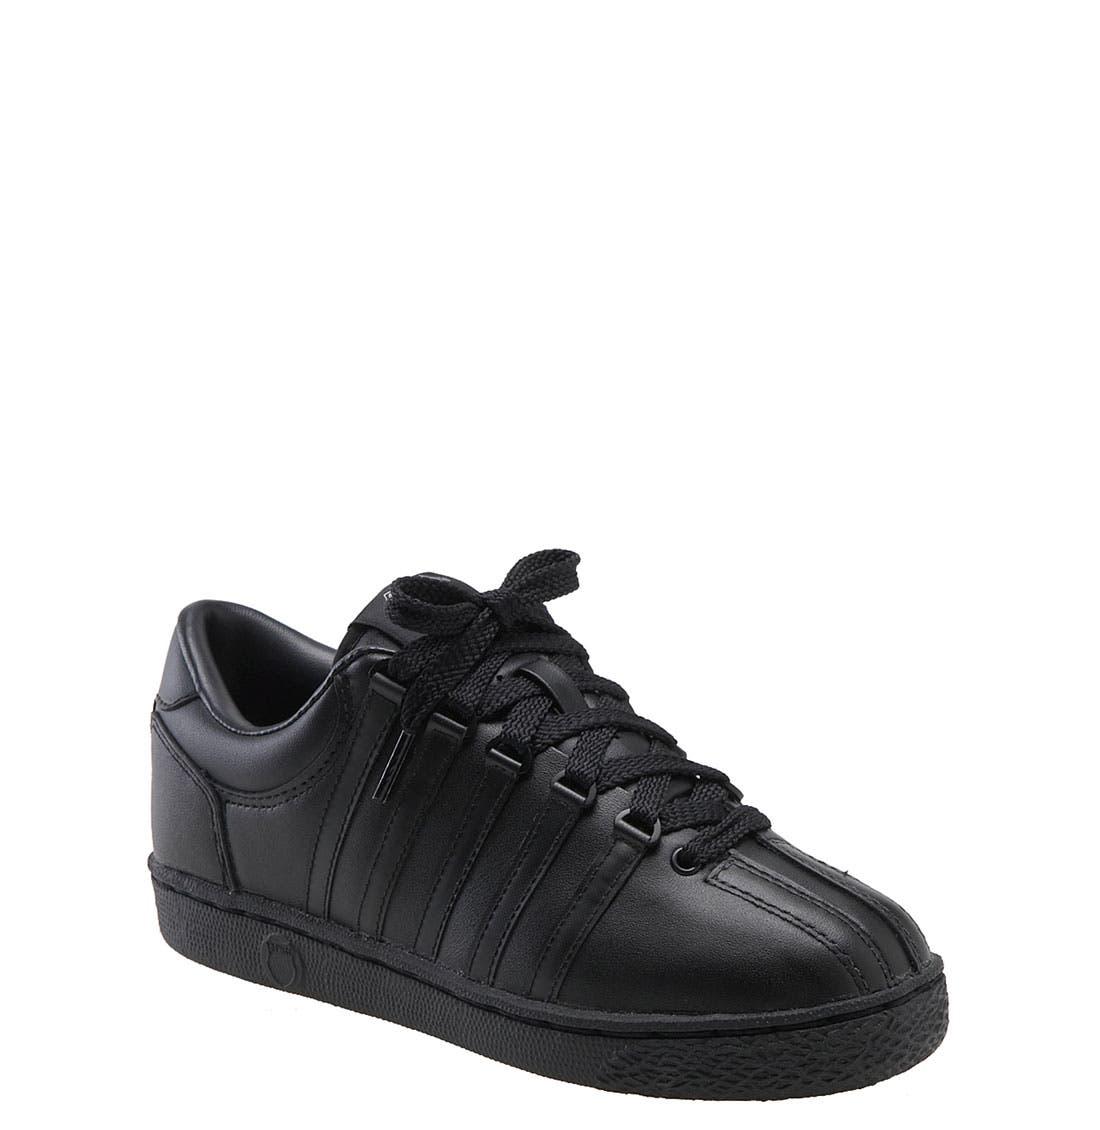 Alternate Image 1 Selected - K-Swiss Classic Sneaker (Toddler, Little Kid & Big Kid)